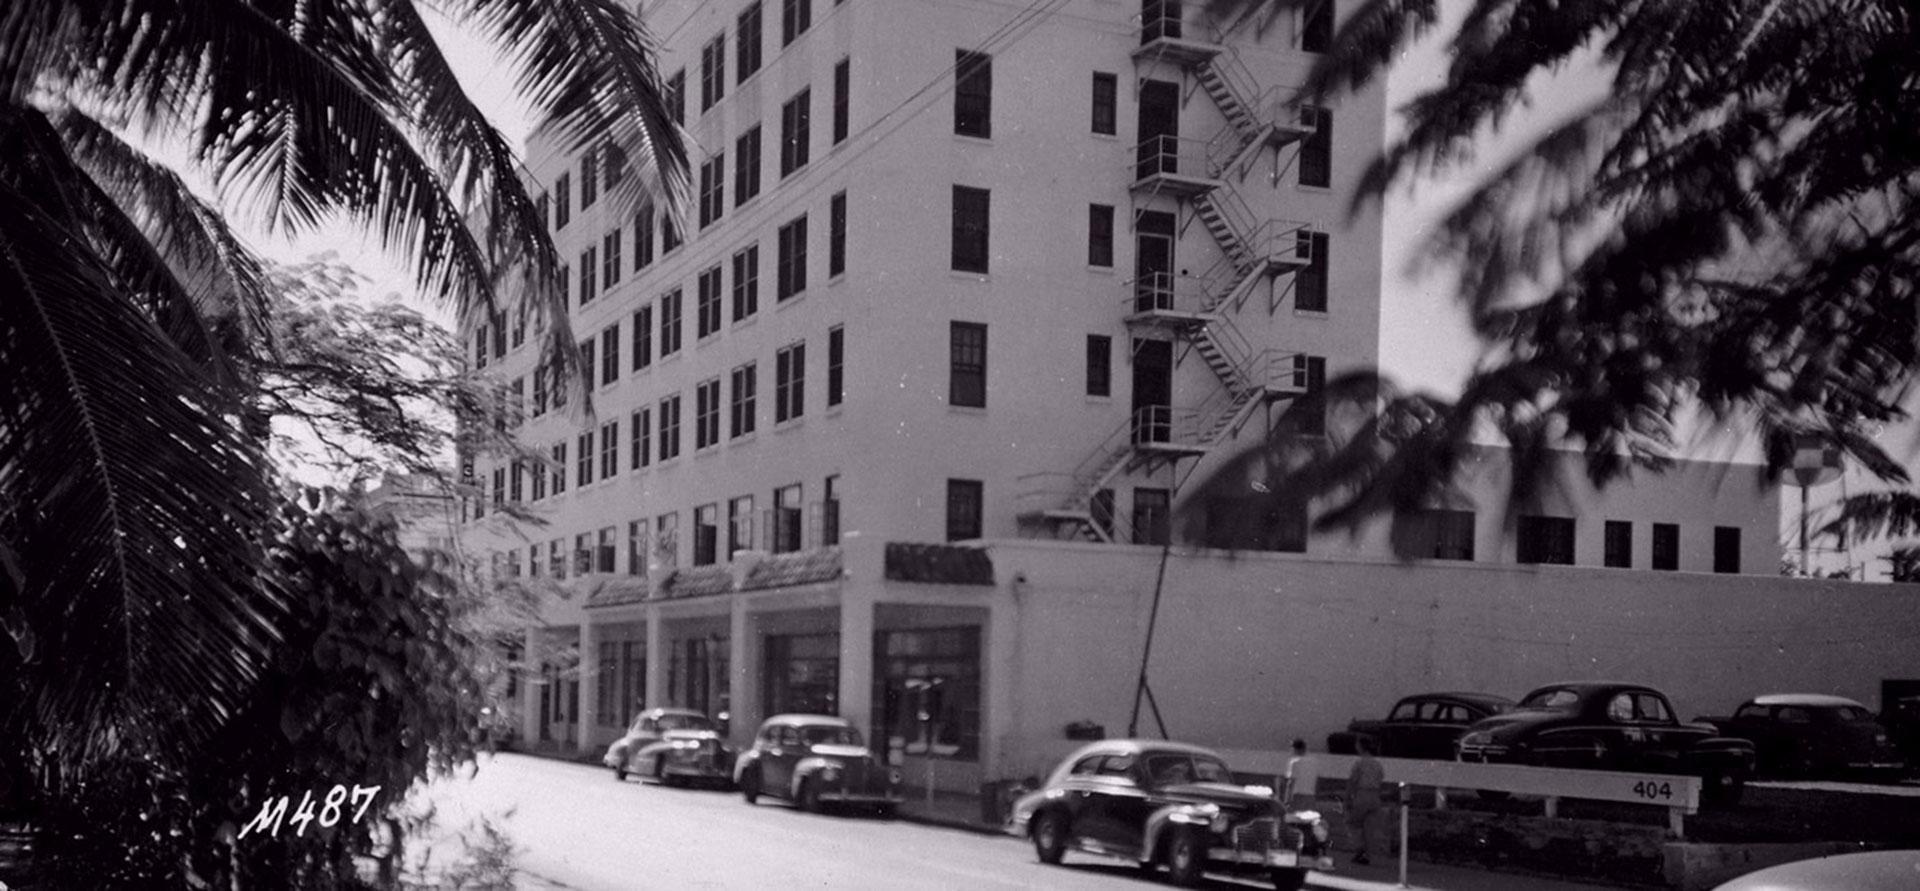 Key West Historic Hotels Landmarks La Concha Hotel Spa